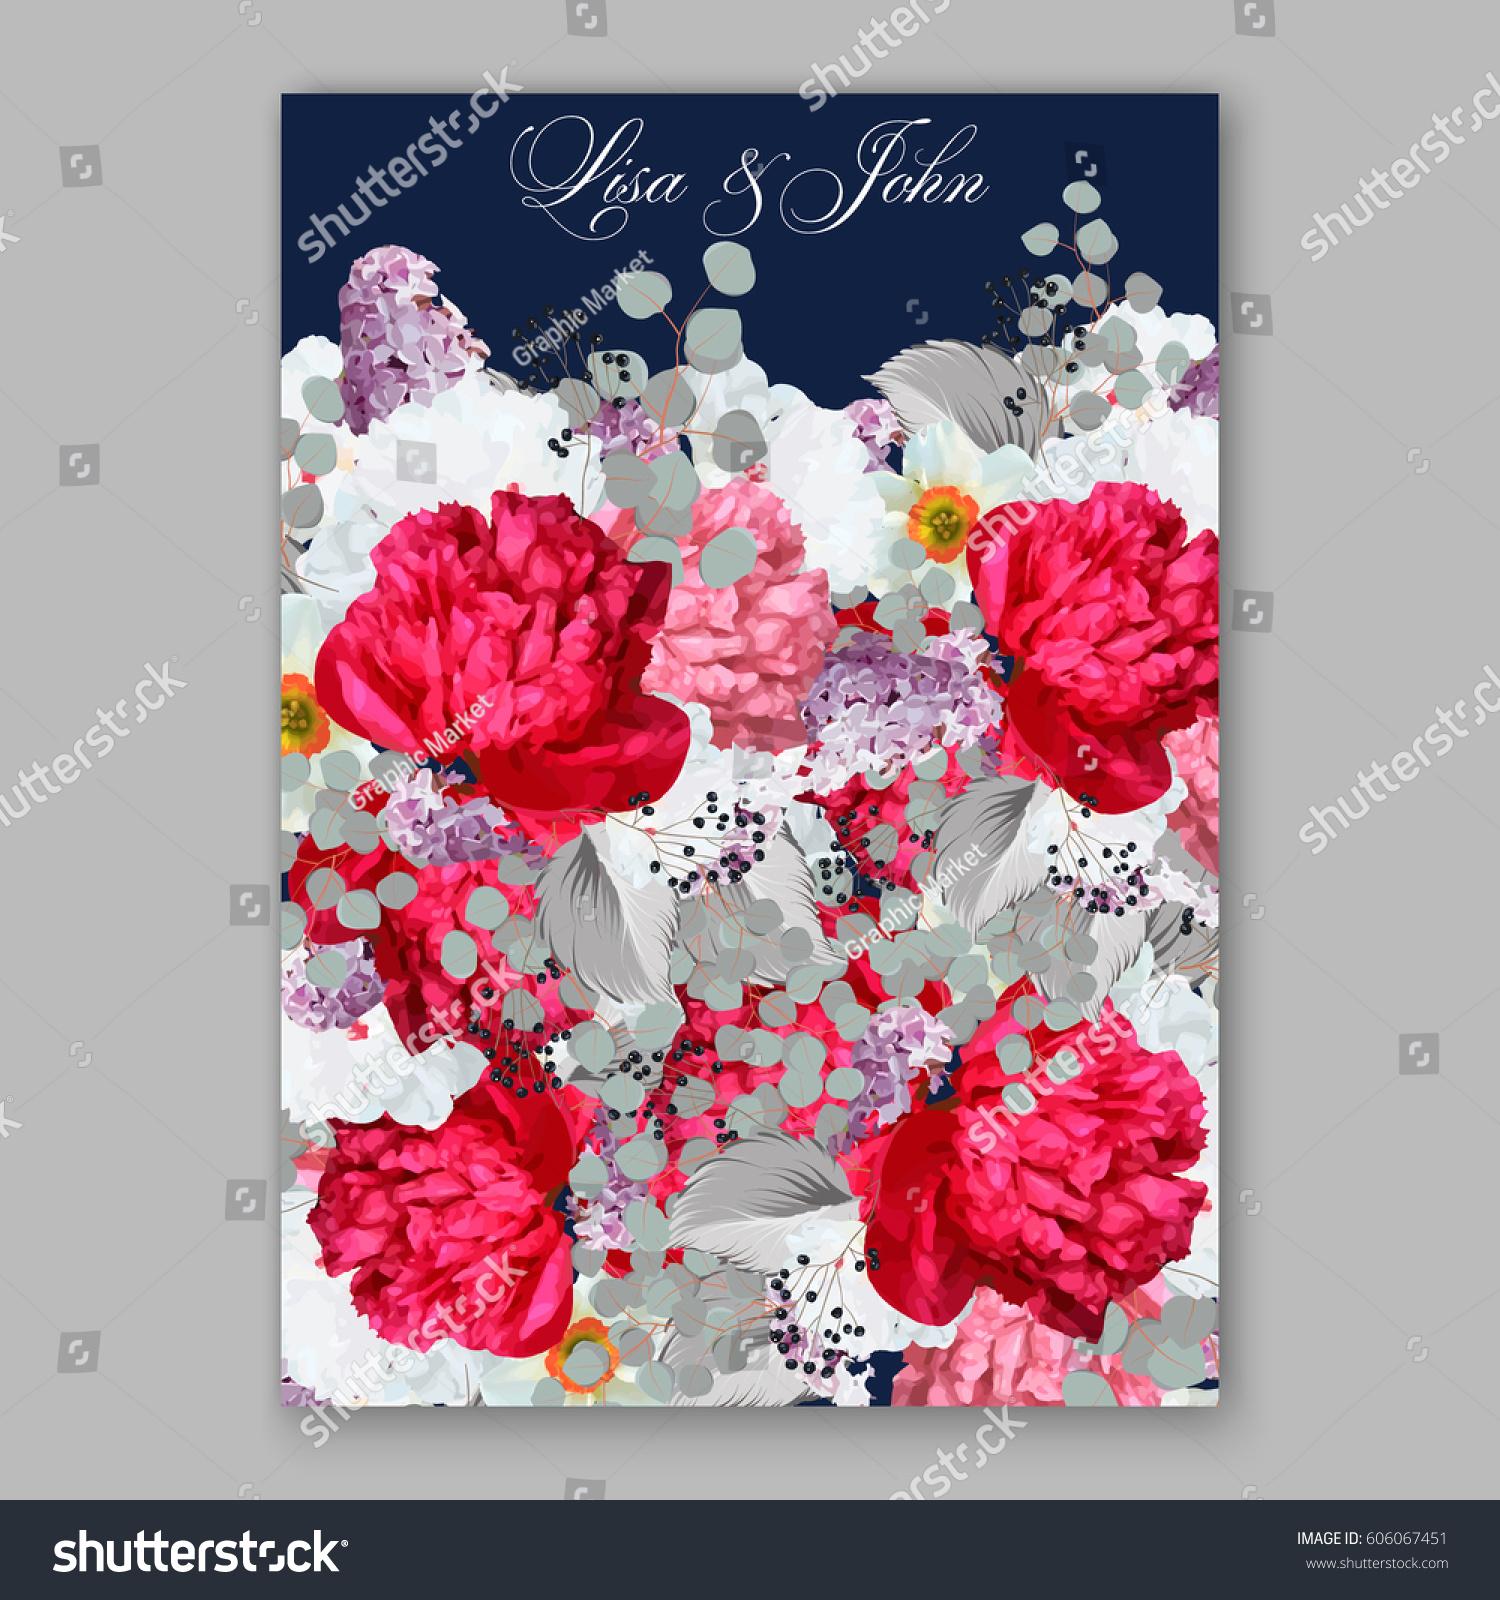 Peony Wedding Invitation Red Spring Flowers Stock Vector 606067451 ...